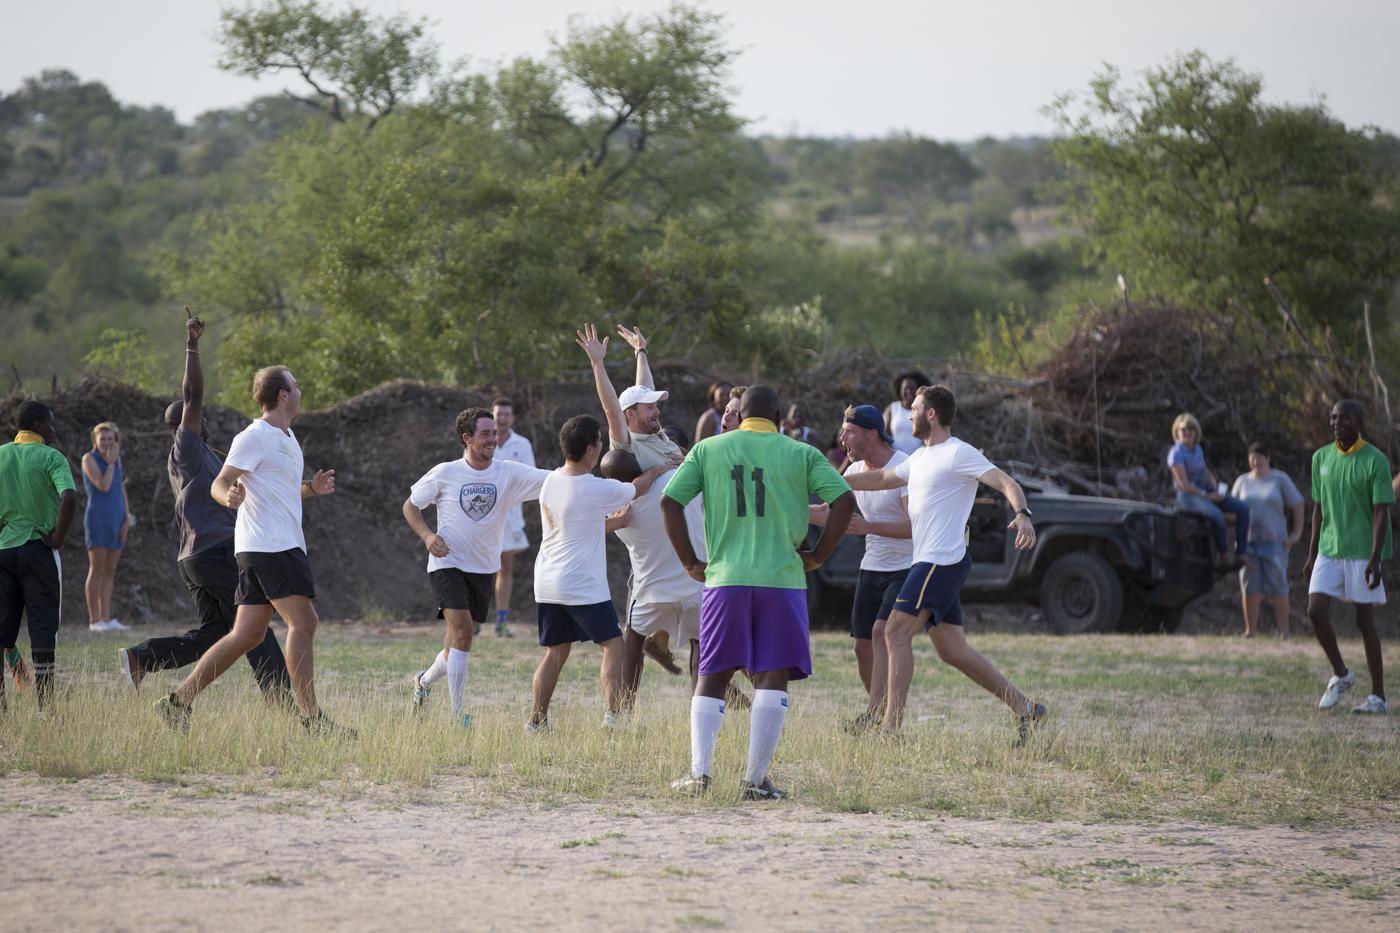 Duncs Celebrate 3 Soccer